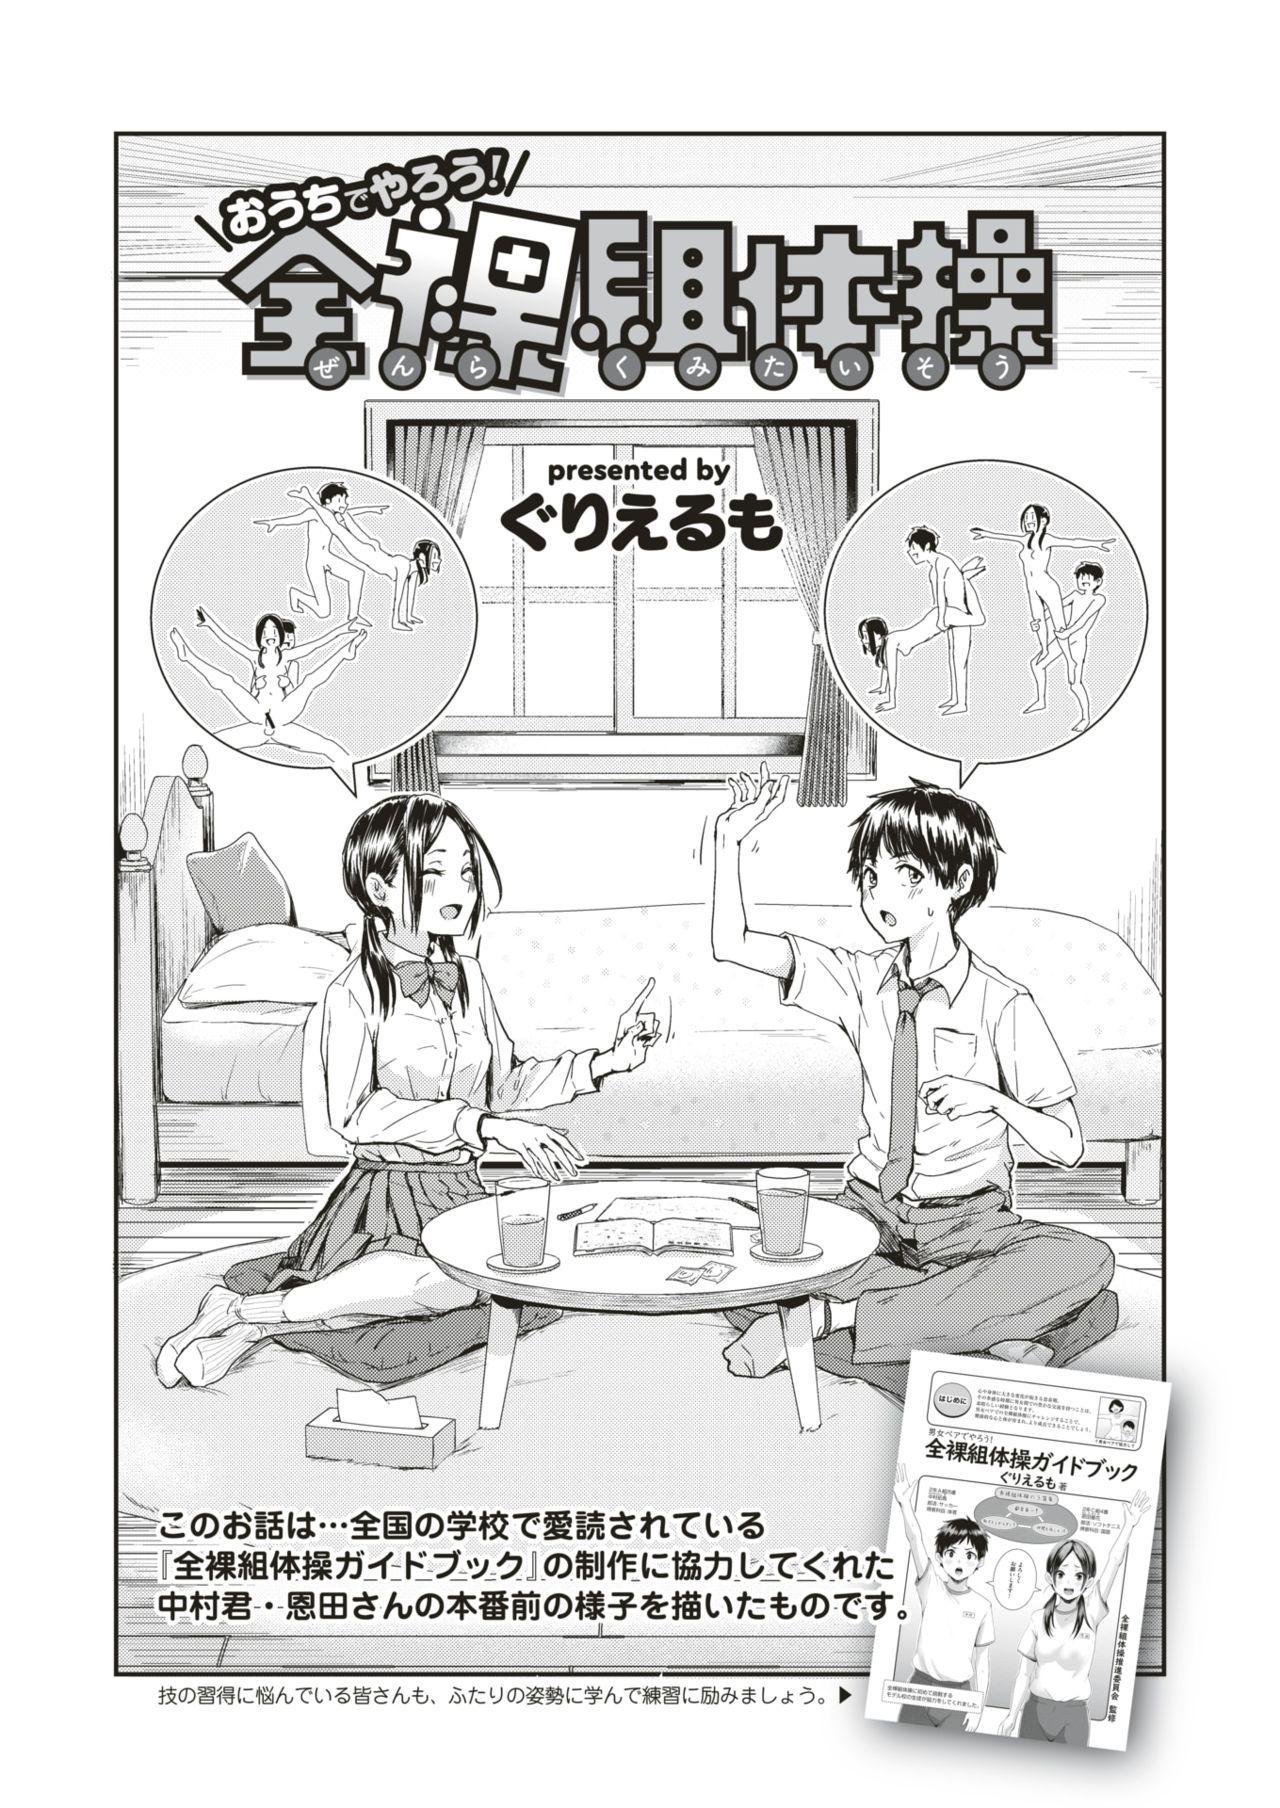 COMIC HAPPINING Vol. 4 11